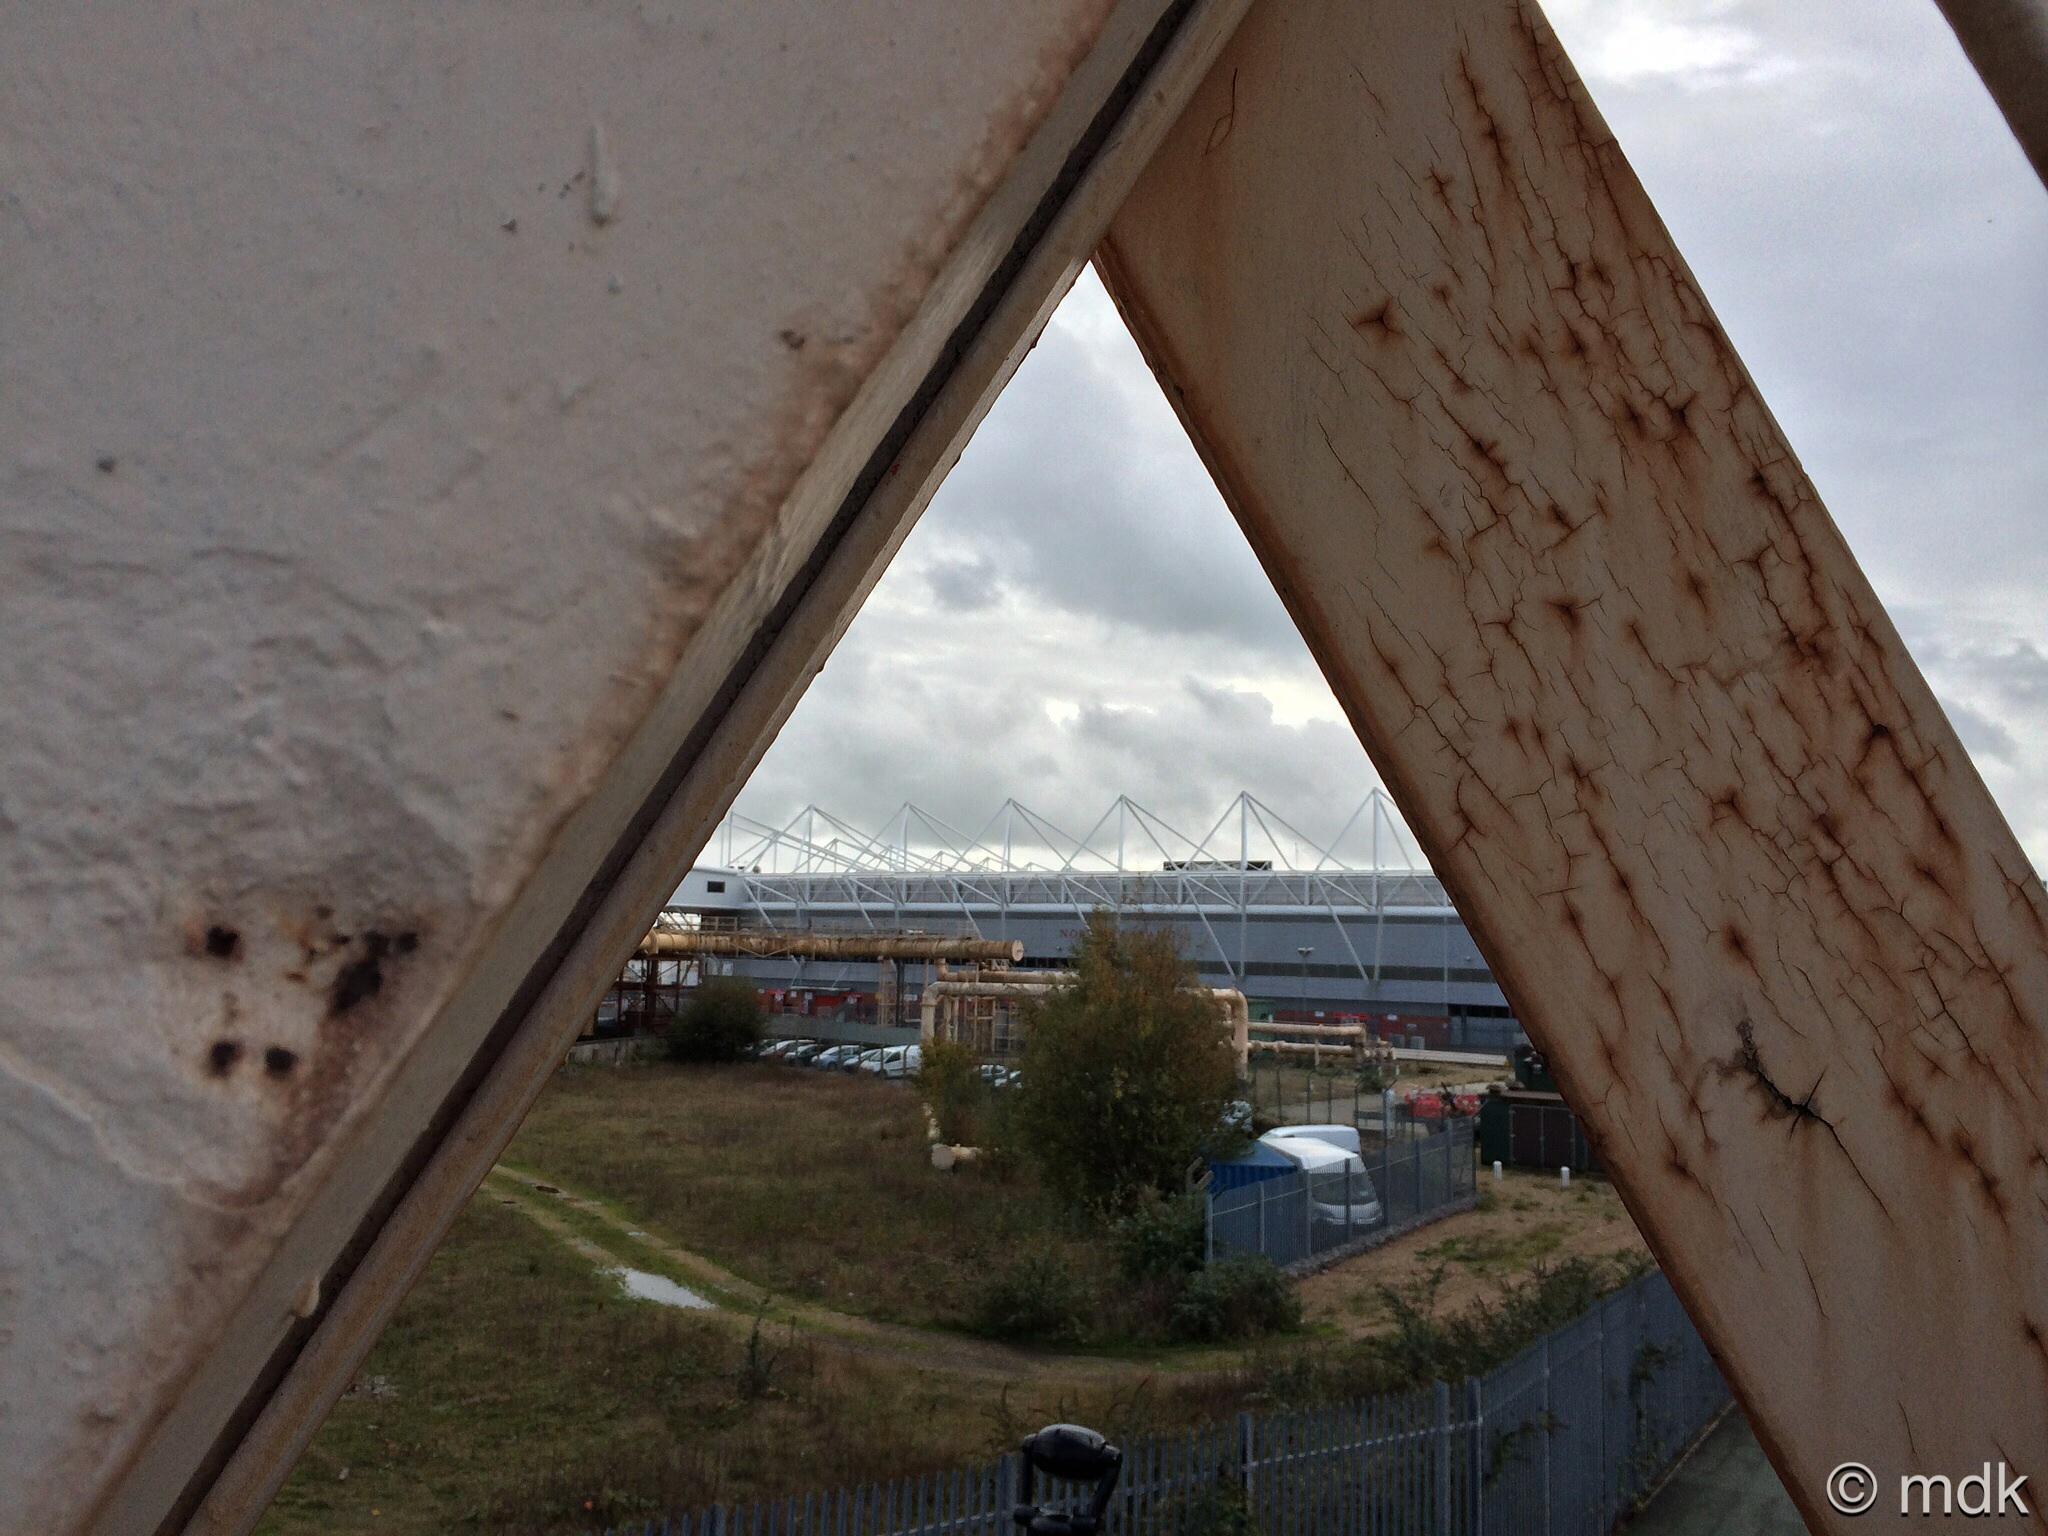 A glimpse of the new Southampton stadium